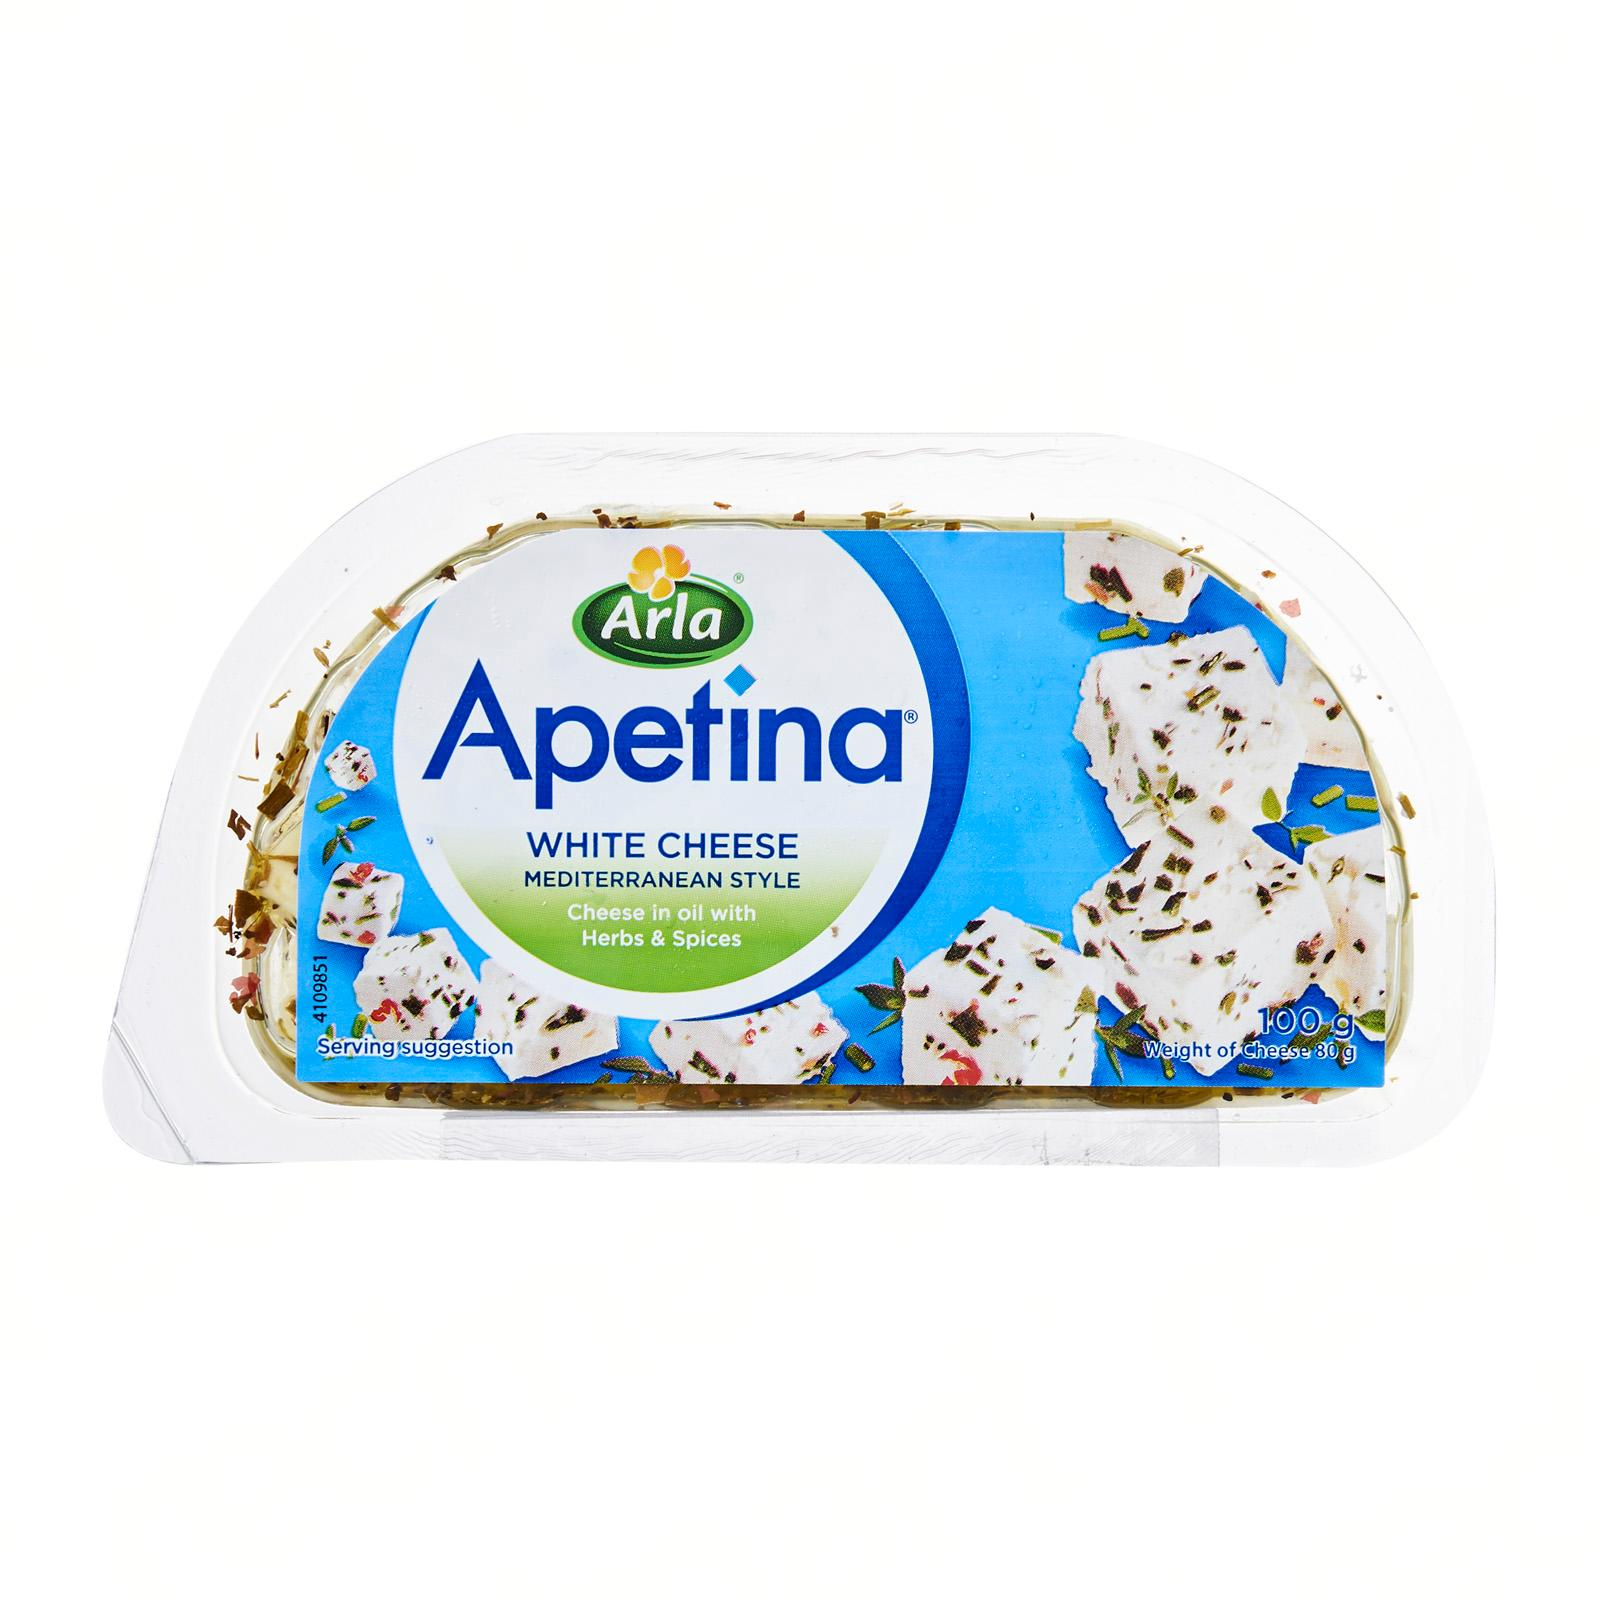 ARLA Apetina Feta With Herbs & Spices 100g